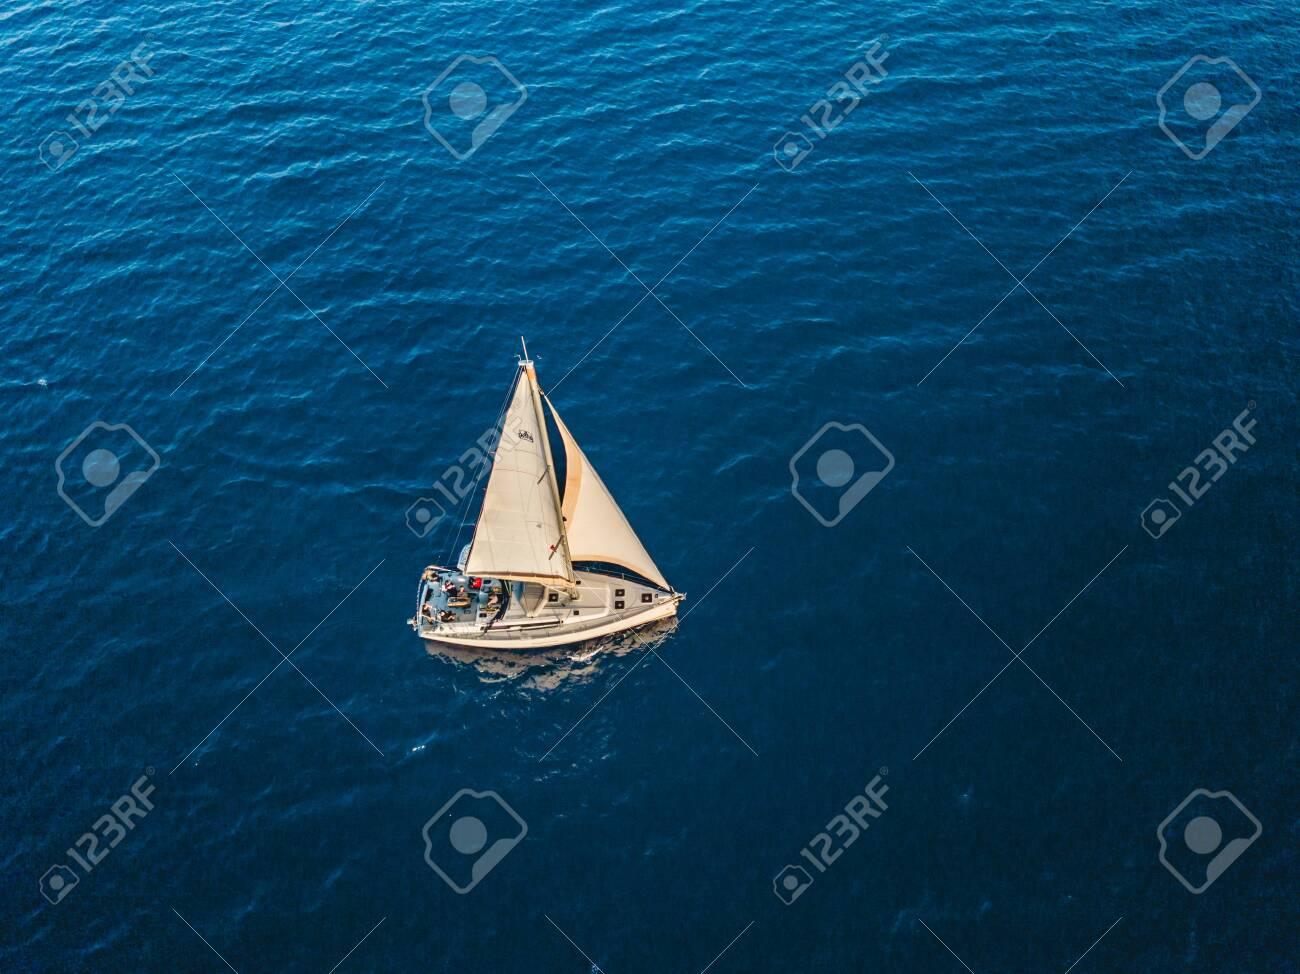 Turkey, Mediterranean sea - 27.10.2019: Fly around the yacht in open sea - 141904782